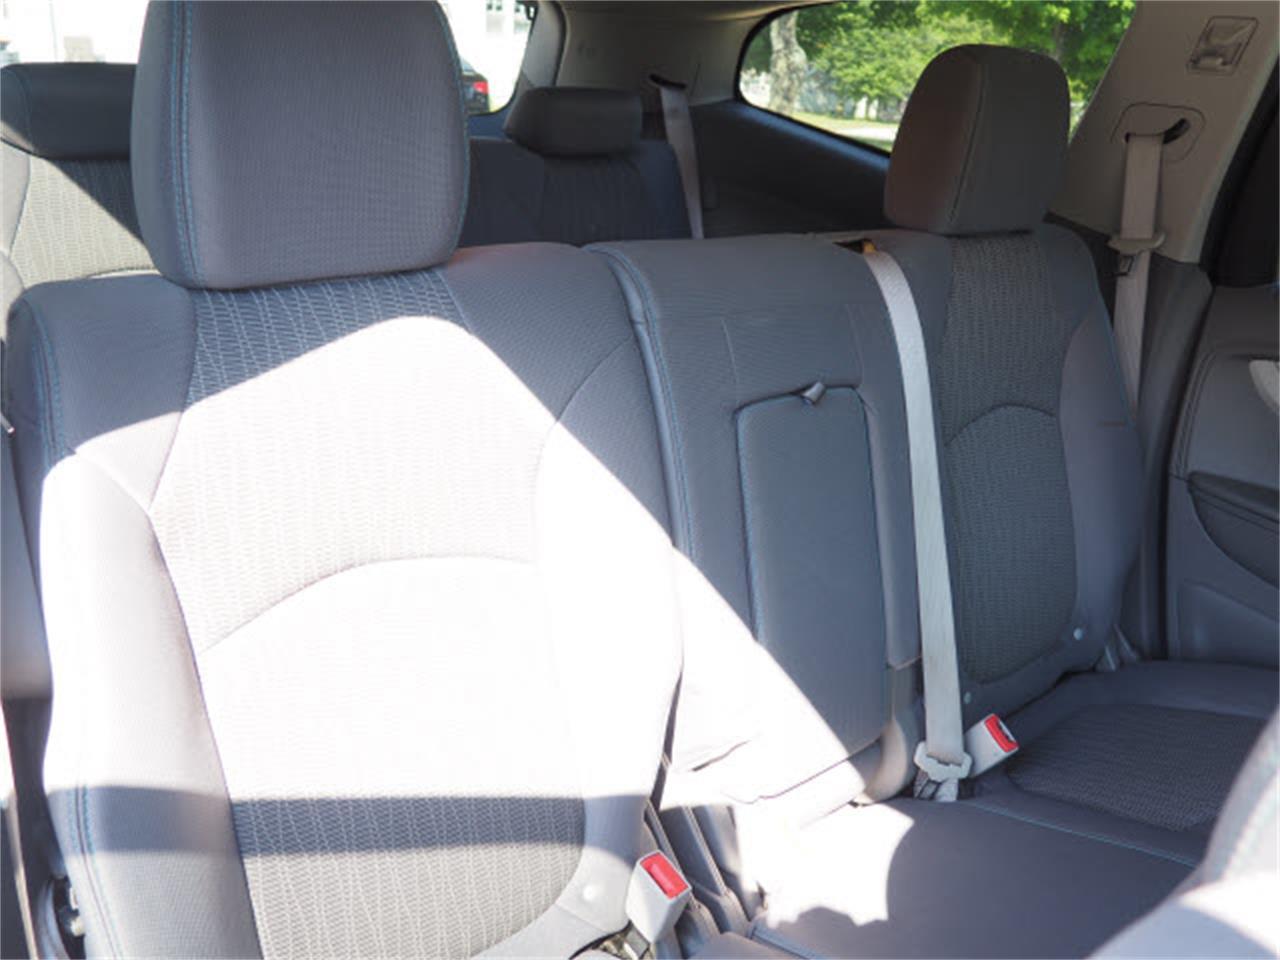 2013 Chevrolet Traverse (CC-1369412) for sale in Marysville, Ohio